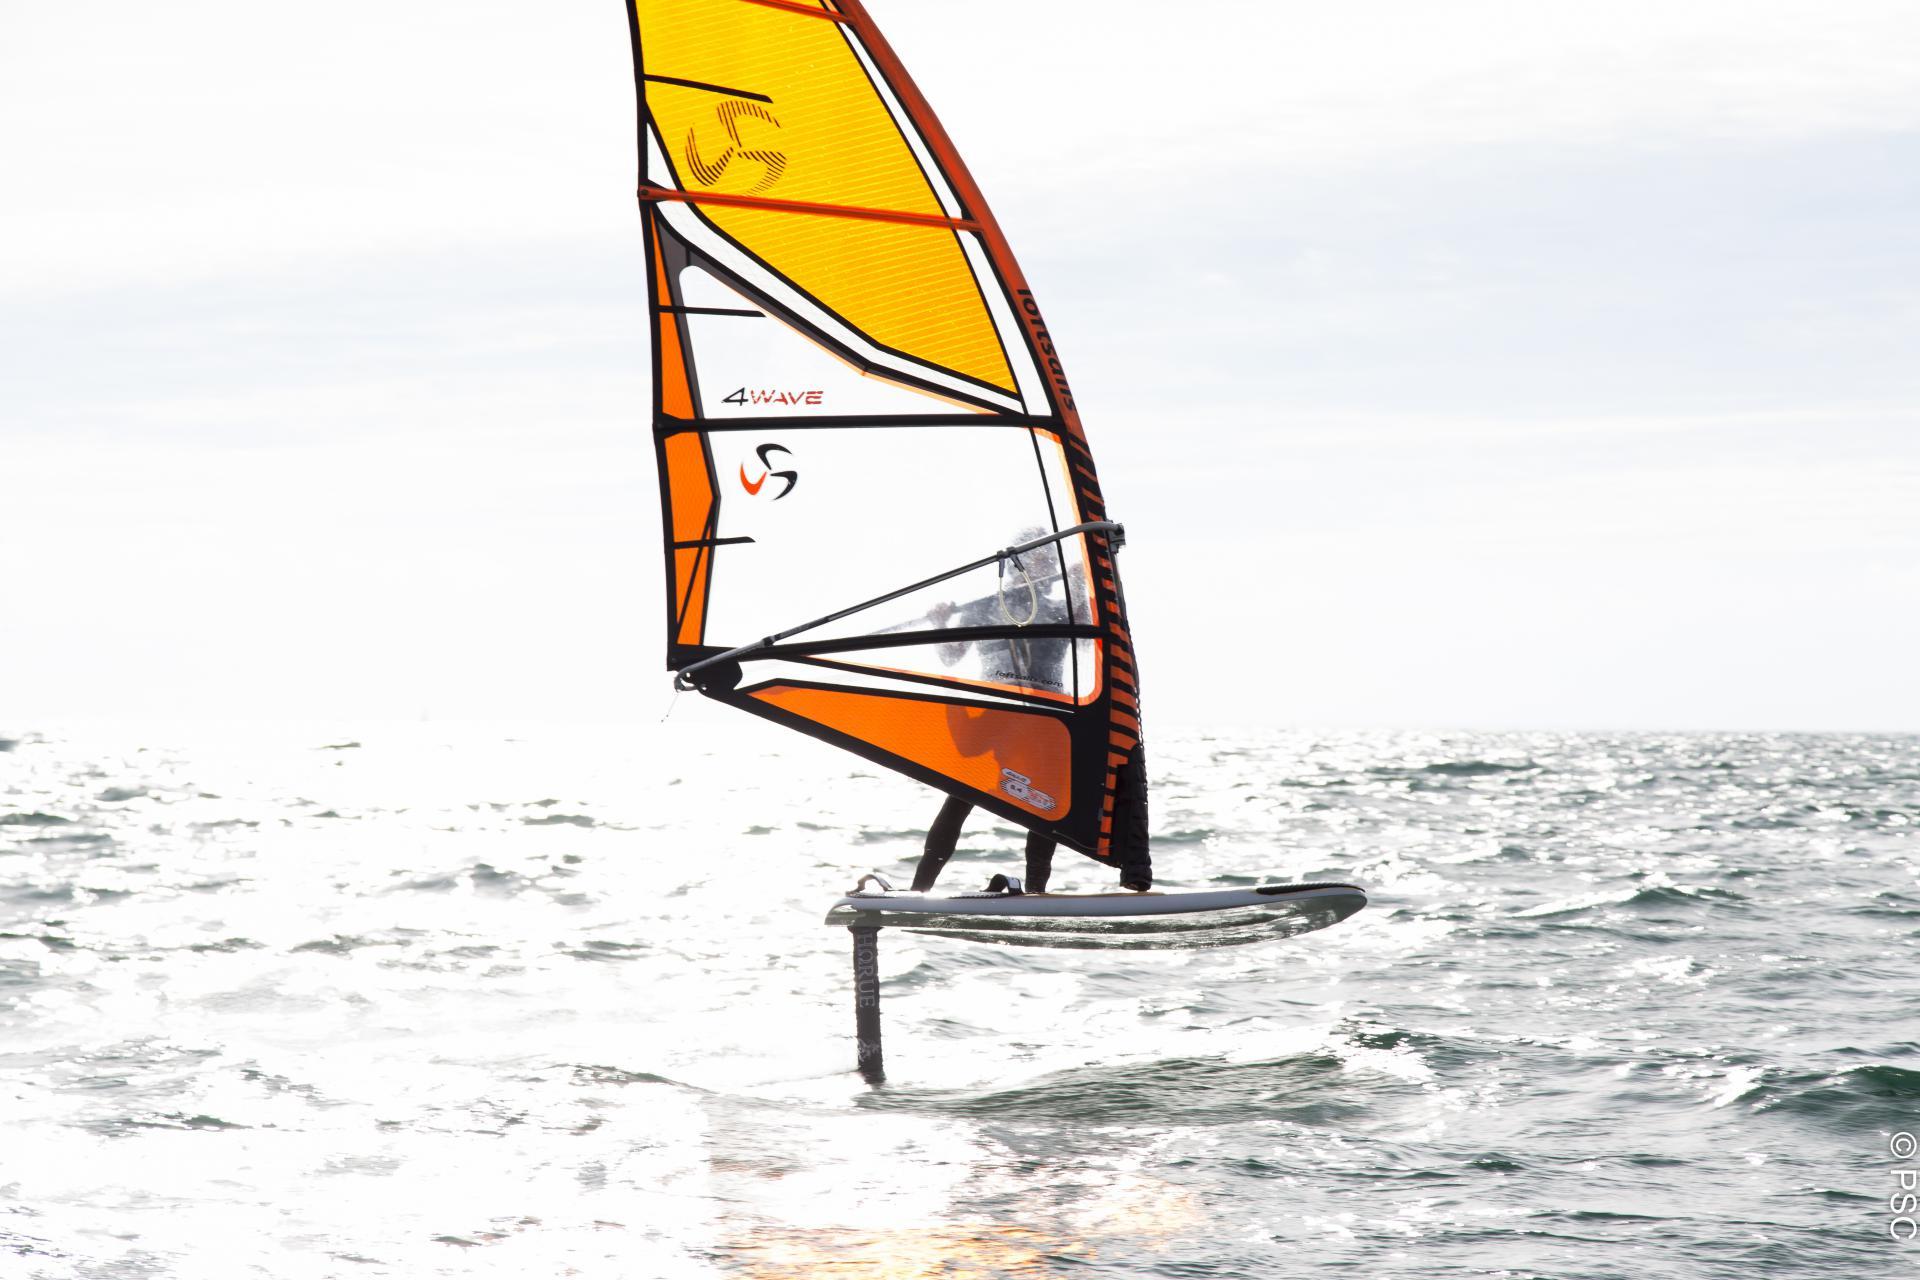 Club Nautique du Rohu  - Windsurf with foil